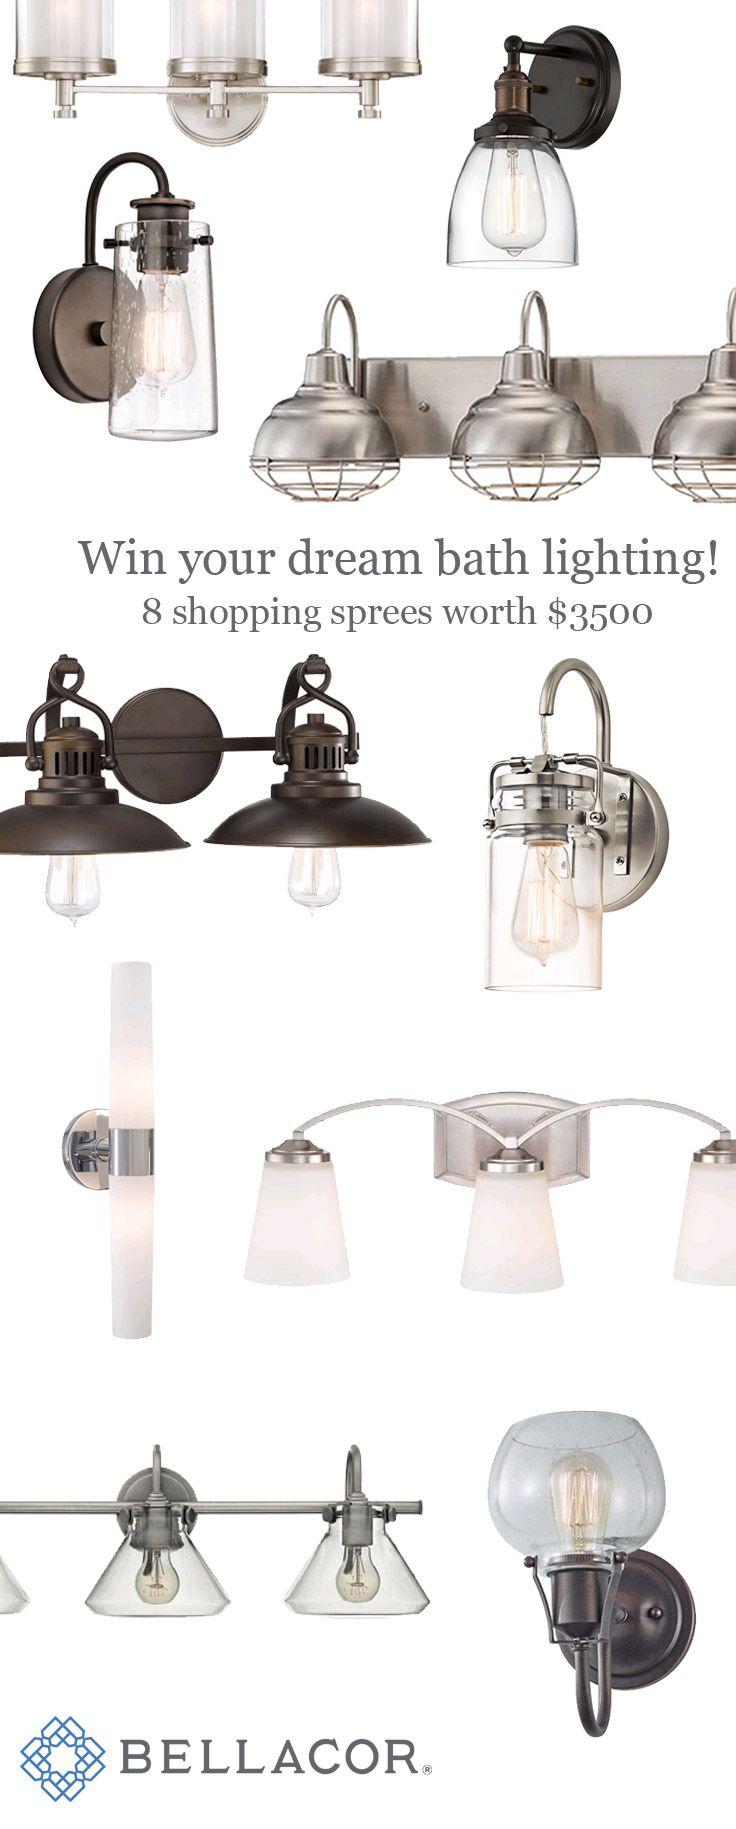 $500 Bath Lighting Shopping Sprees! Pick out your dream bathroom lighting at Bellacor.com